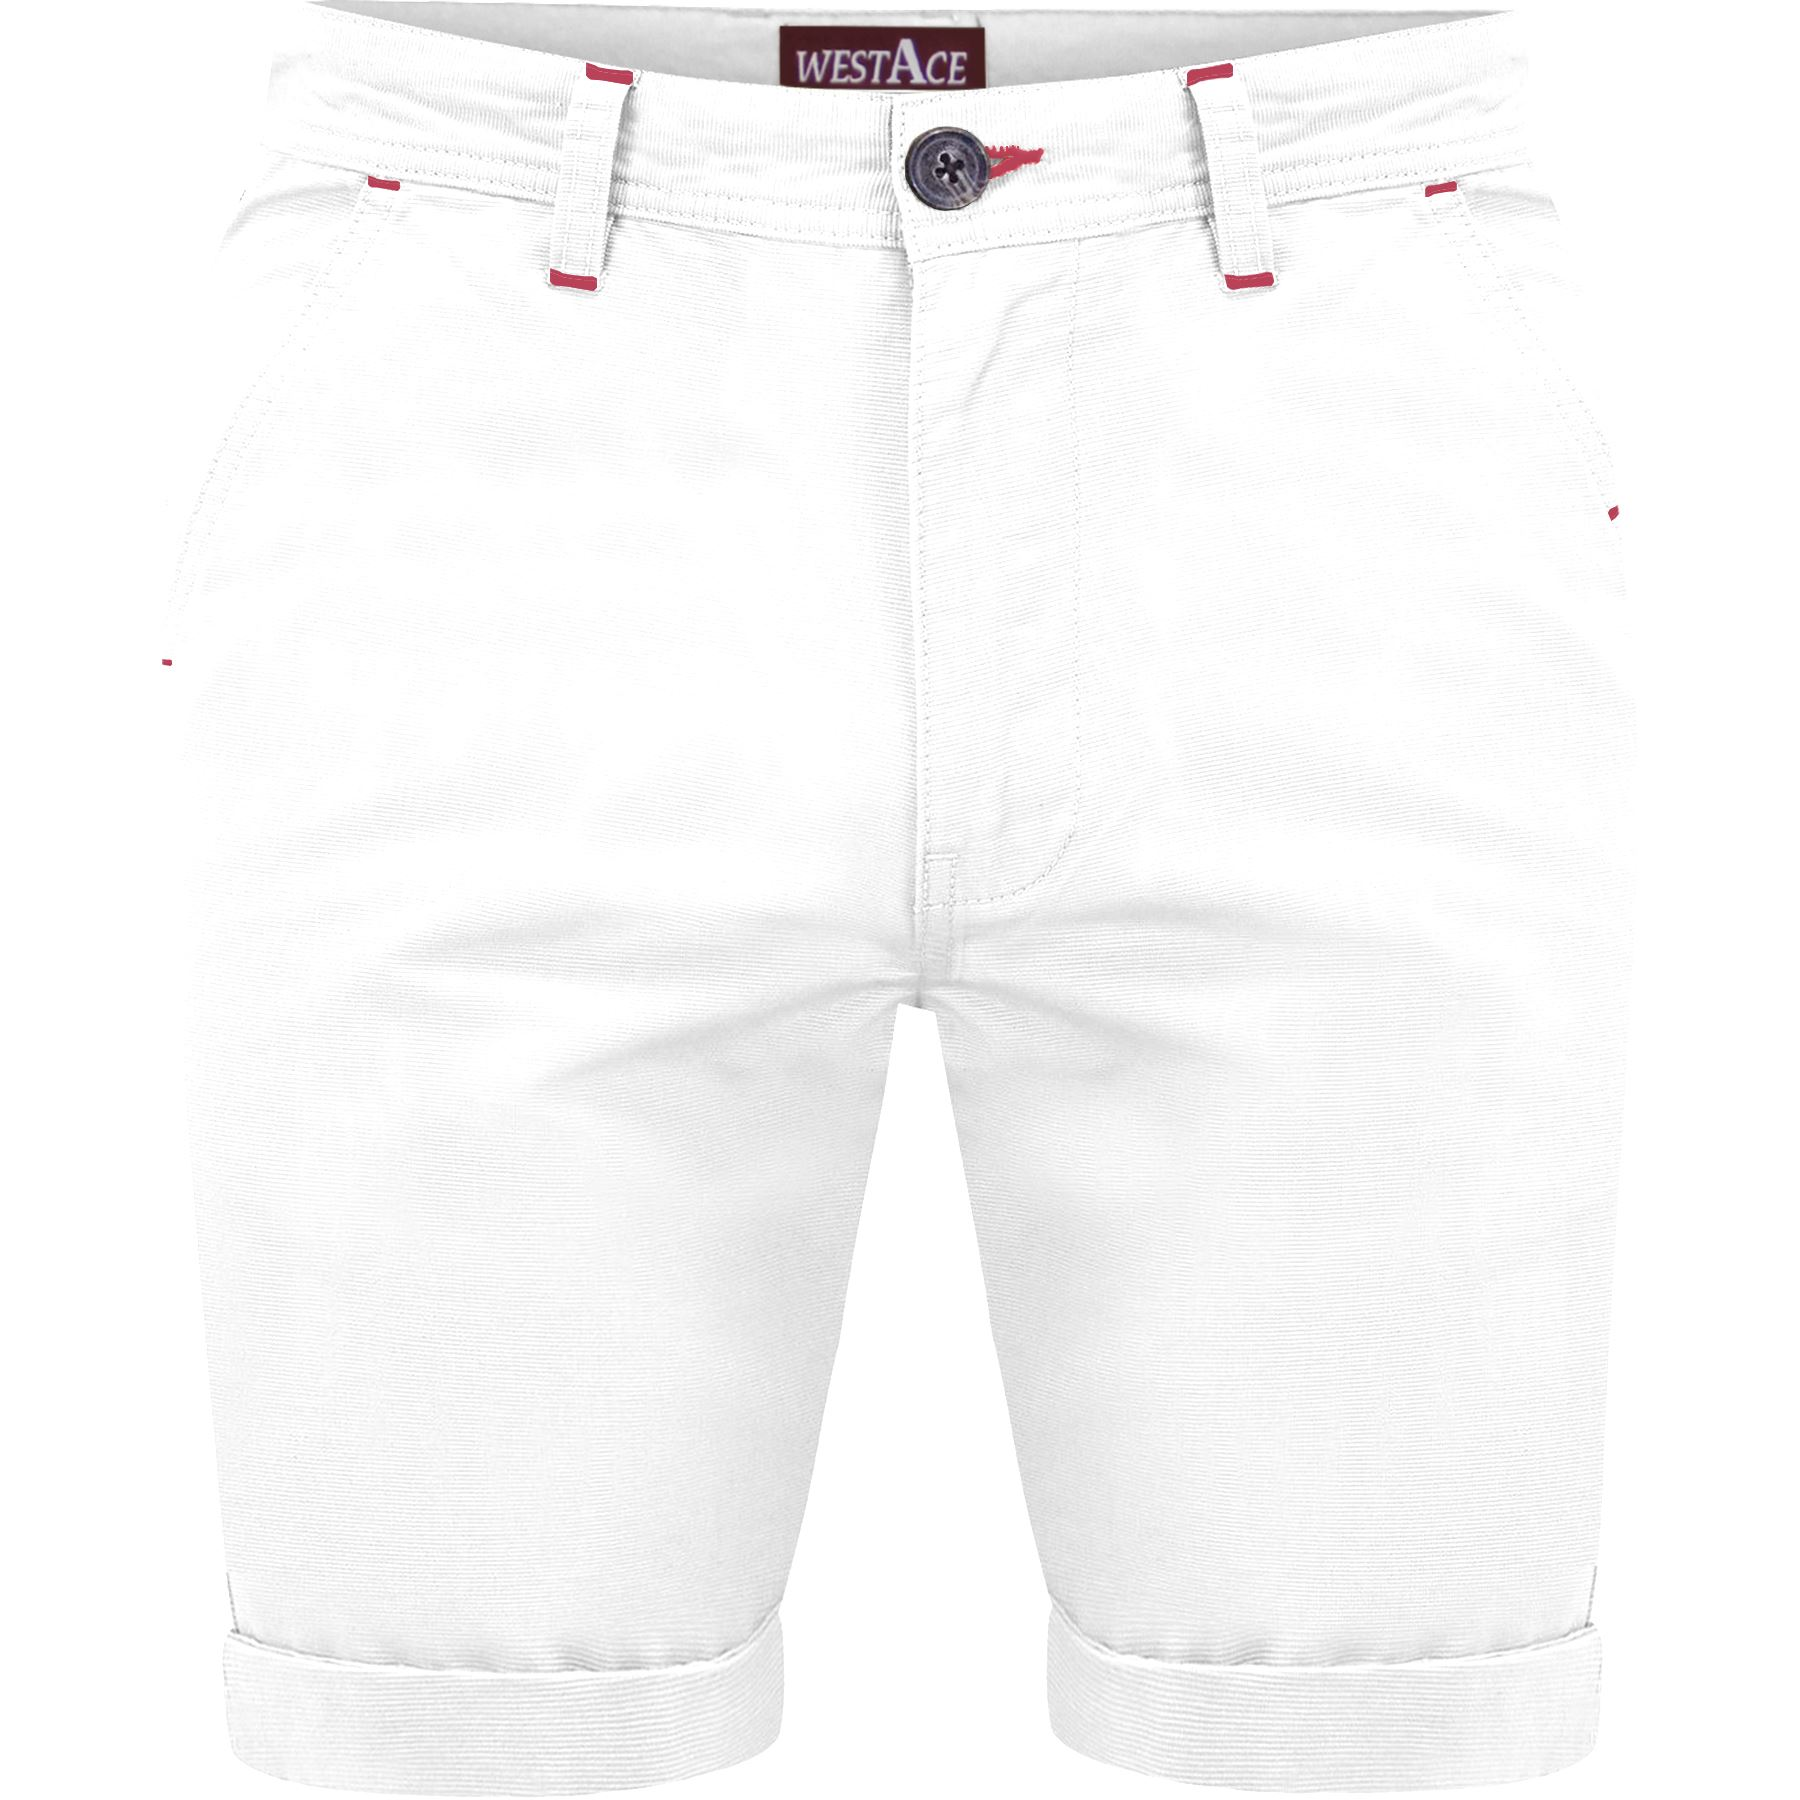 Mens-Chino-Shorts-Cotton-Summer-Casual-Jeans-Cargo-Combat-Half-Pants-Casual-New thumbnail 17